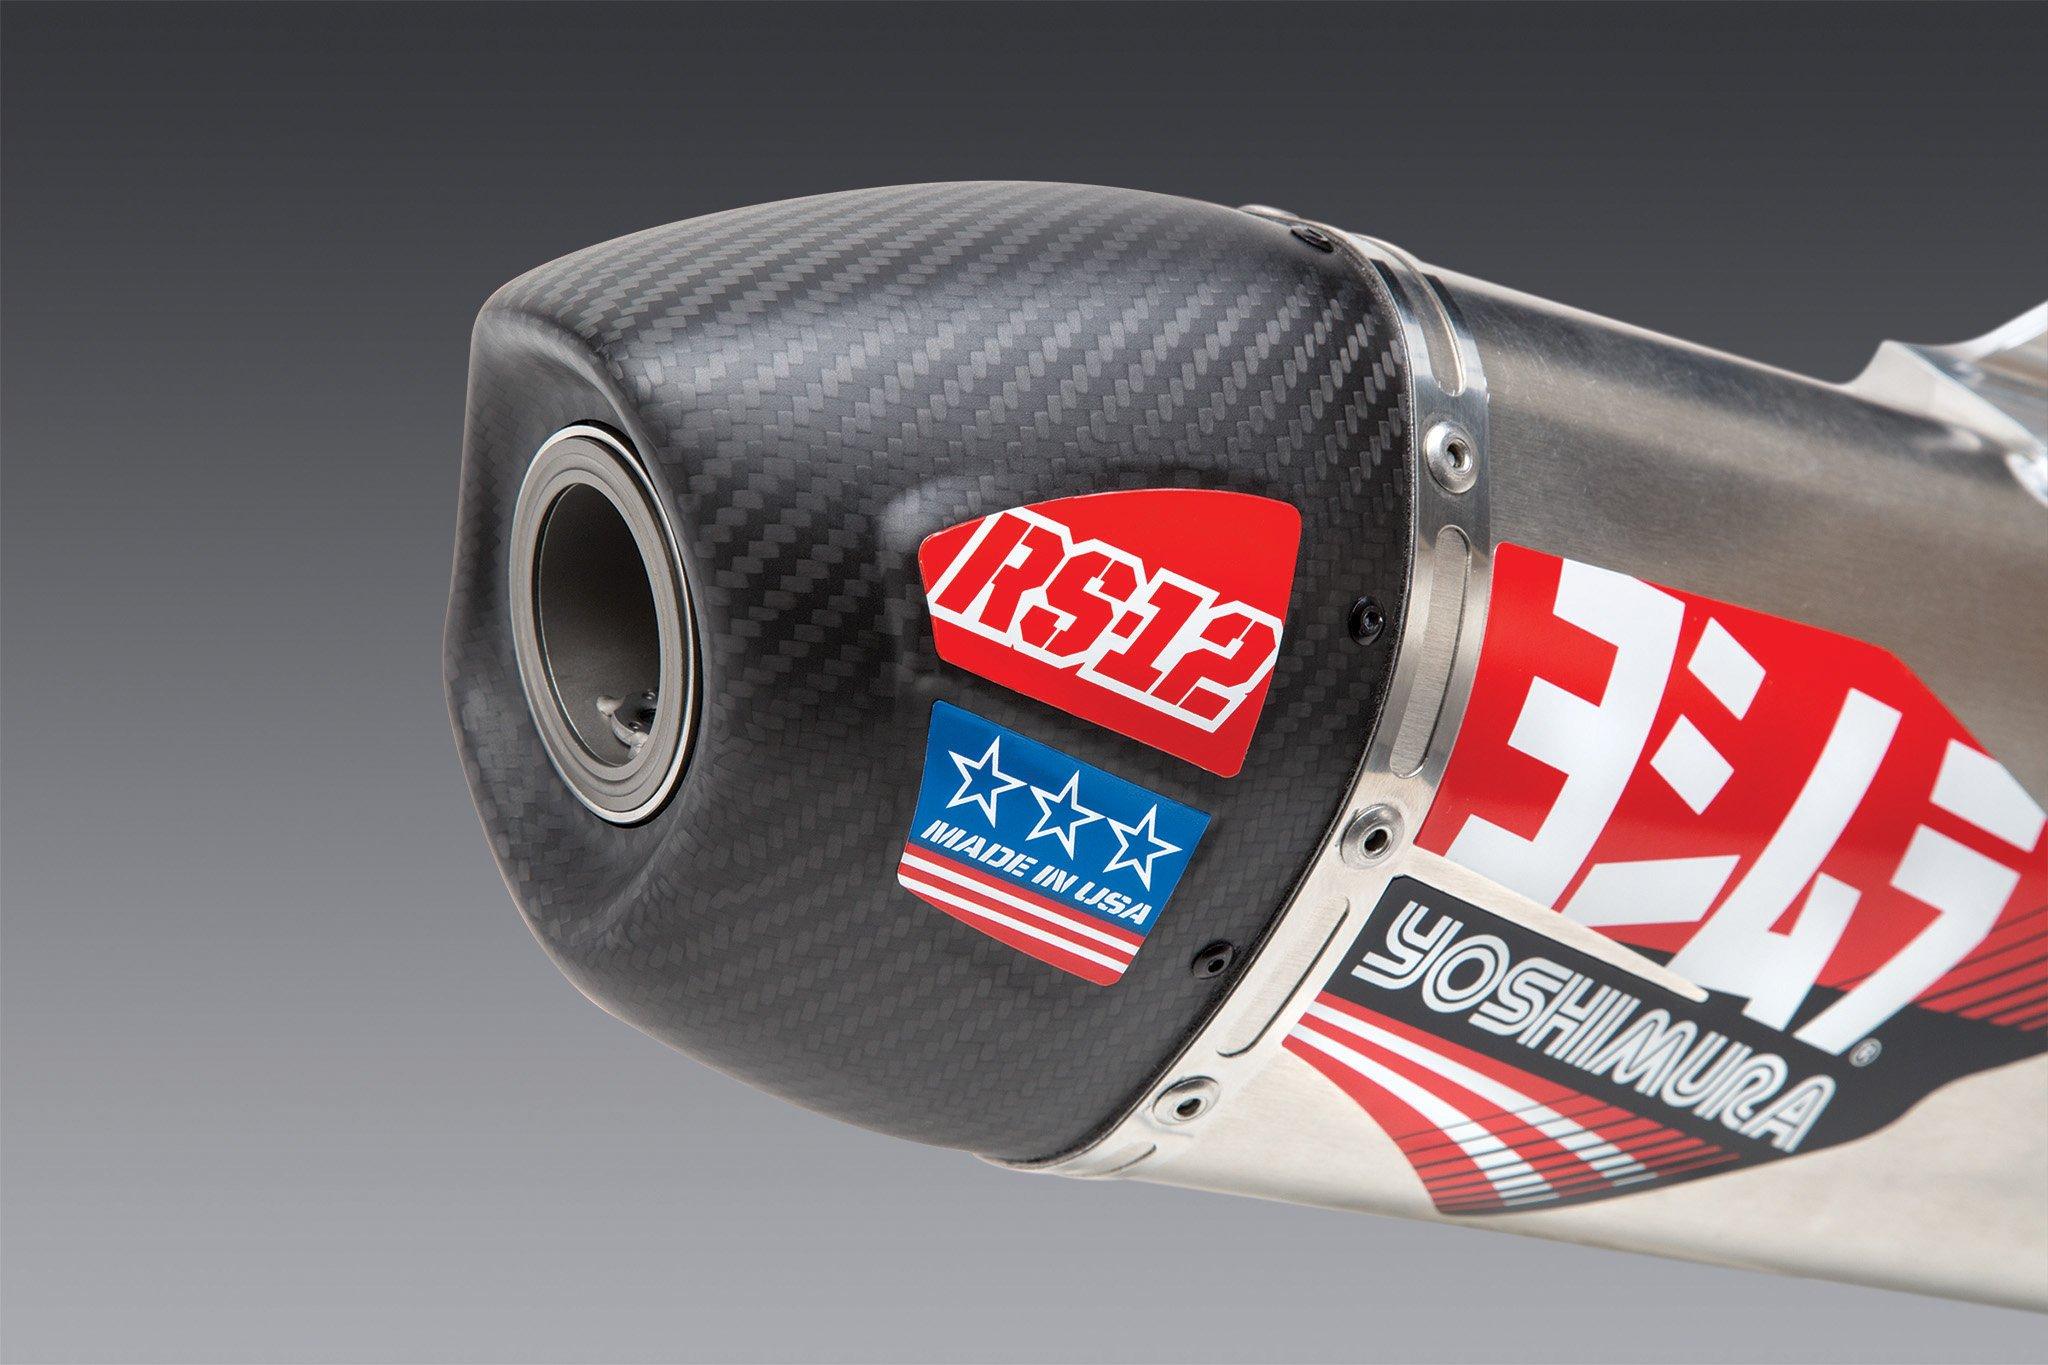 Yoshimura RS-12 KTM 500 EXC-F (2020-2021) / Husqvarna FE 501S (2020-2021) Stainless Full Exhaust/Aluminum Muffler